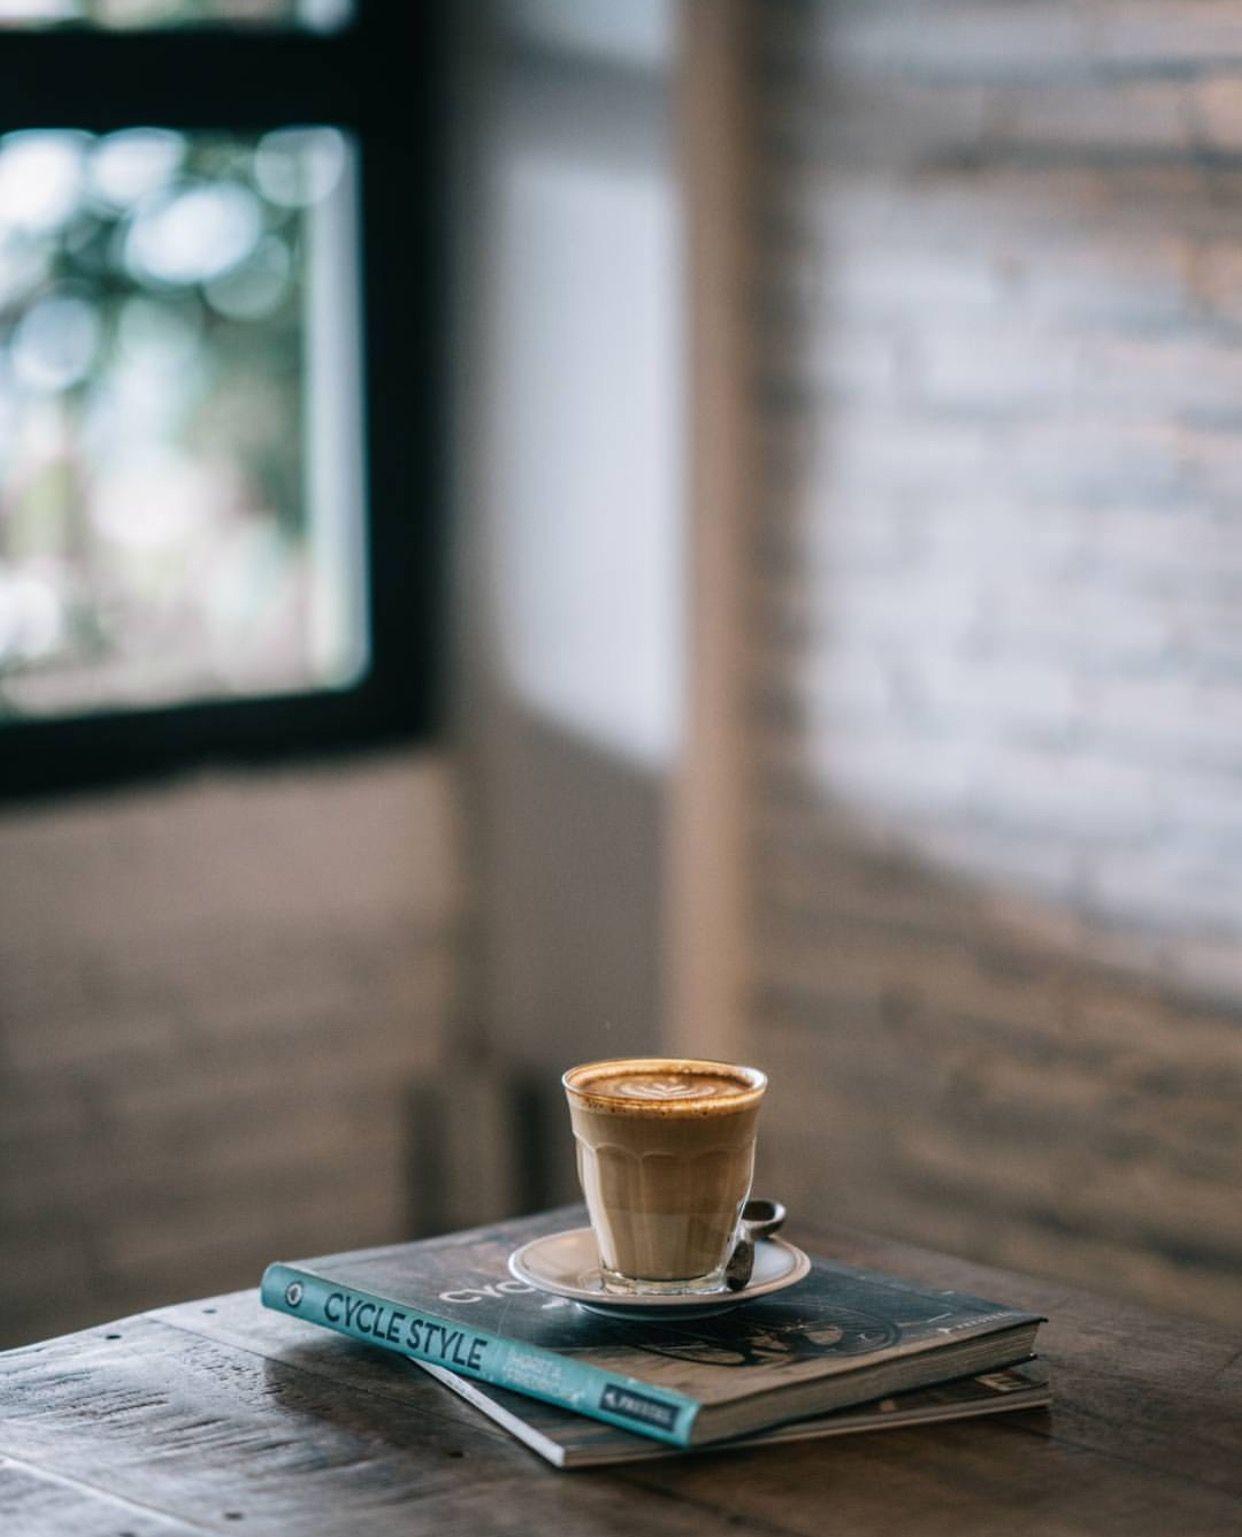 Pin by Shalanda Shannon on Caffeine kick Coffee